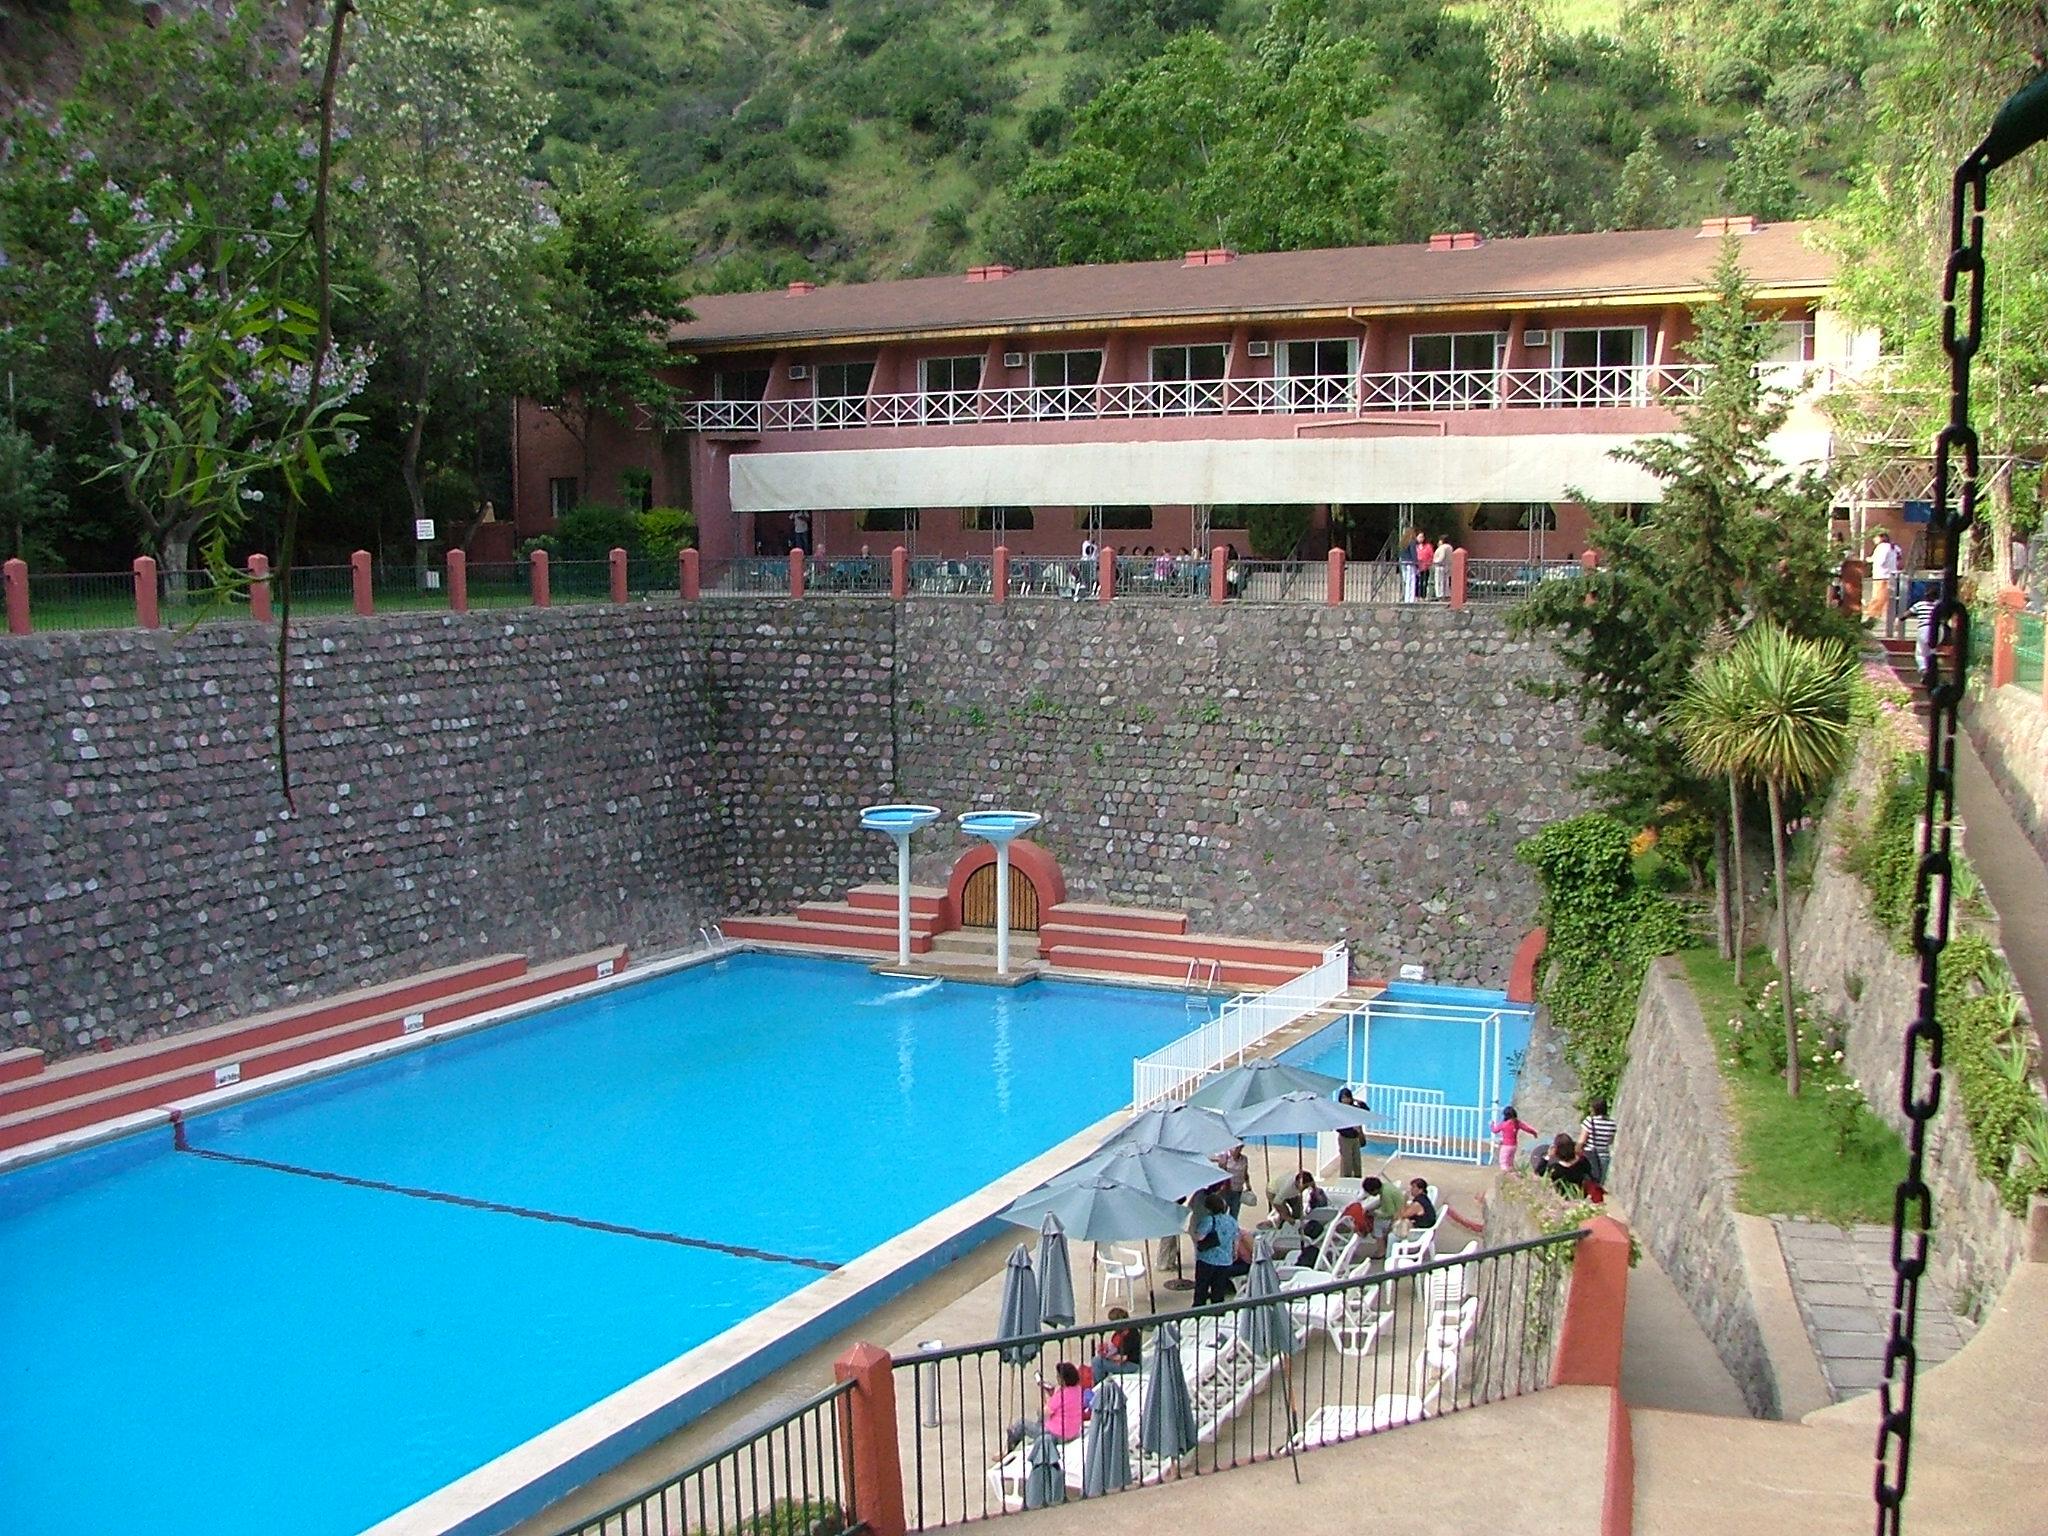 Hotel militar termas de colina guiature gu a centros for Construccion de piscinas precios chile